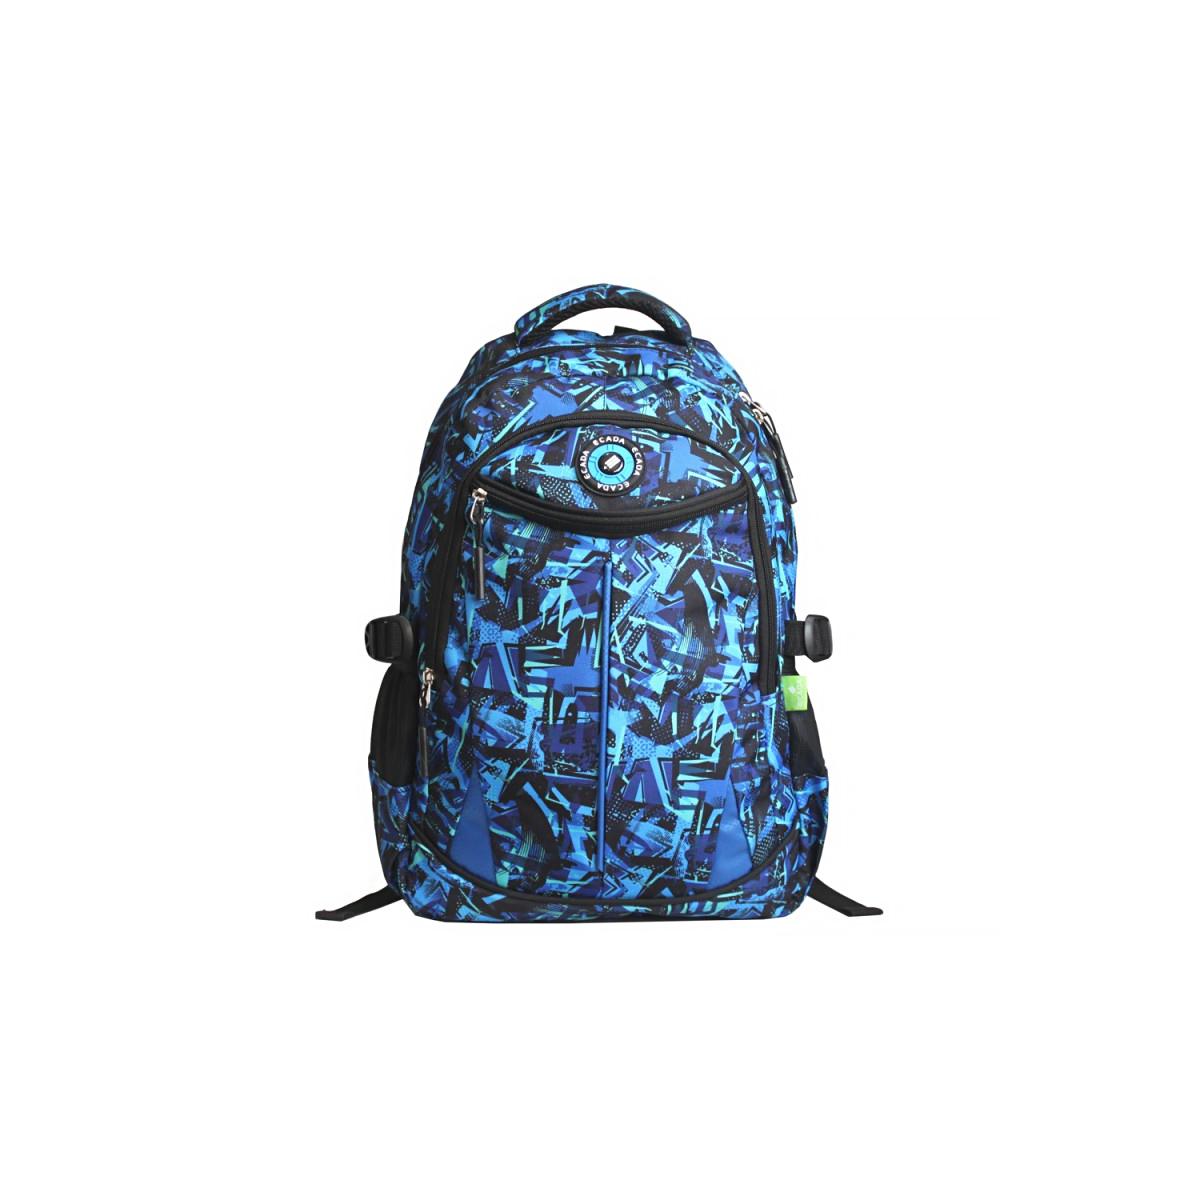 Ghiozdan Școlar Pentru Adolescenți, Albastru, Abstract, Ecada, 61461